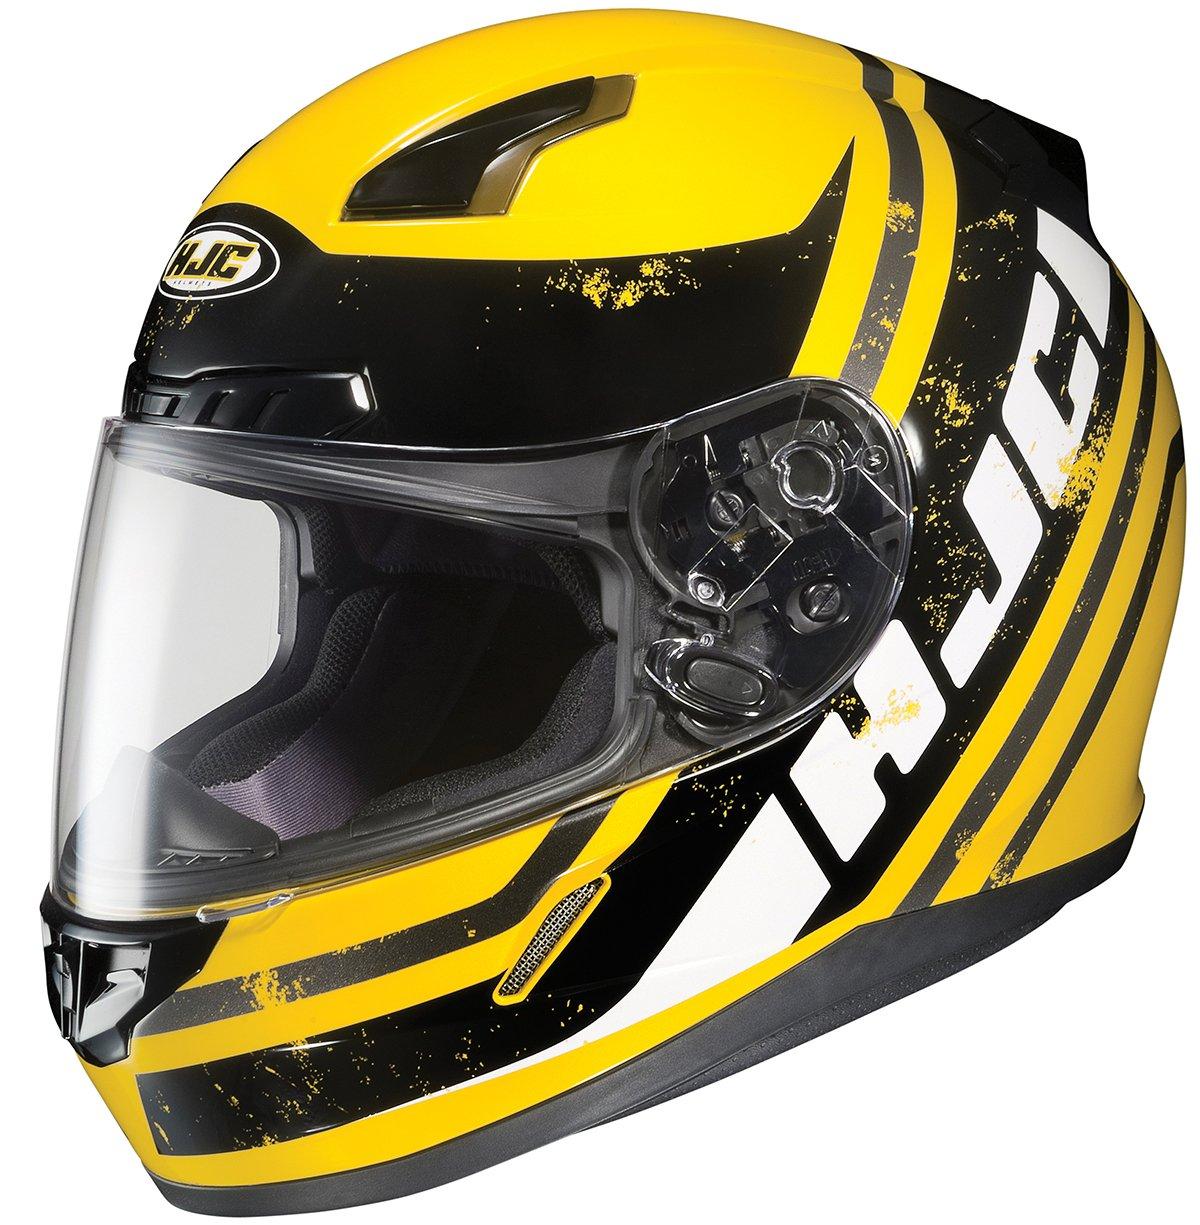 HJC 826-914 CL-17 Victory Full-Face Motorcycle Helmet MC-1, Large